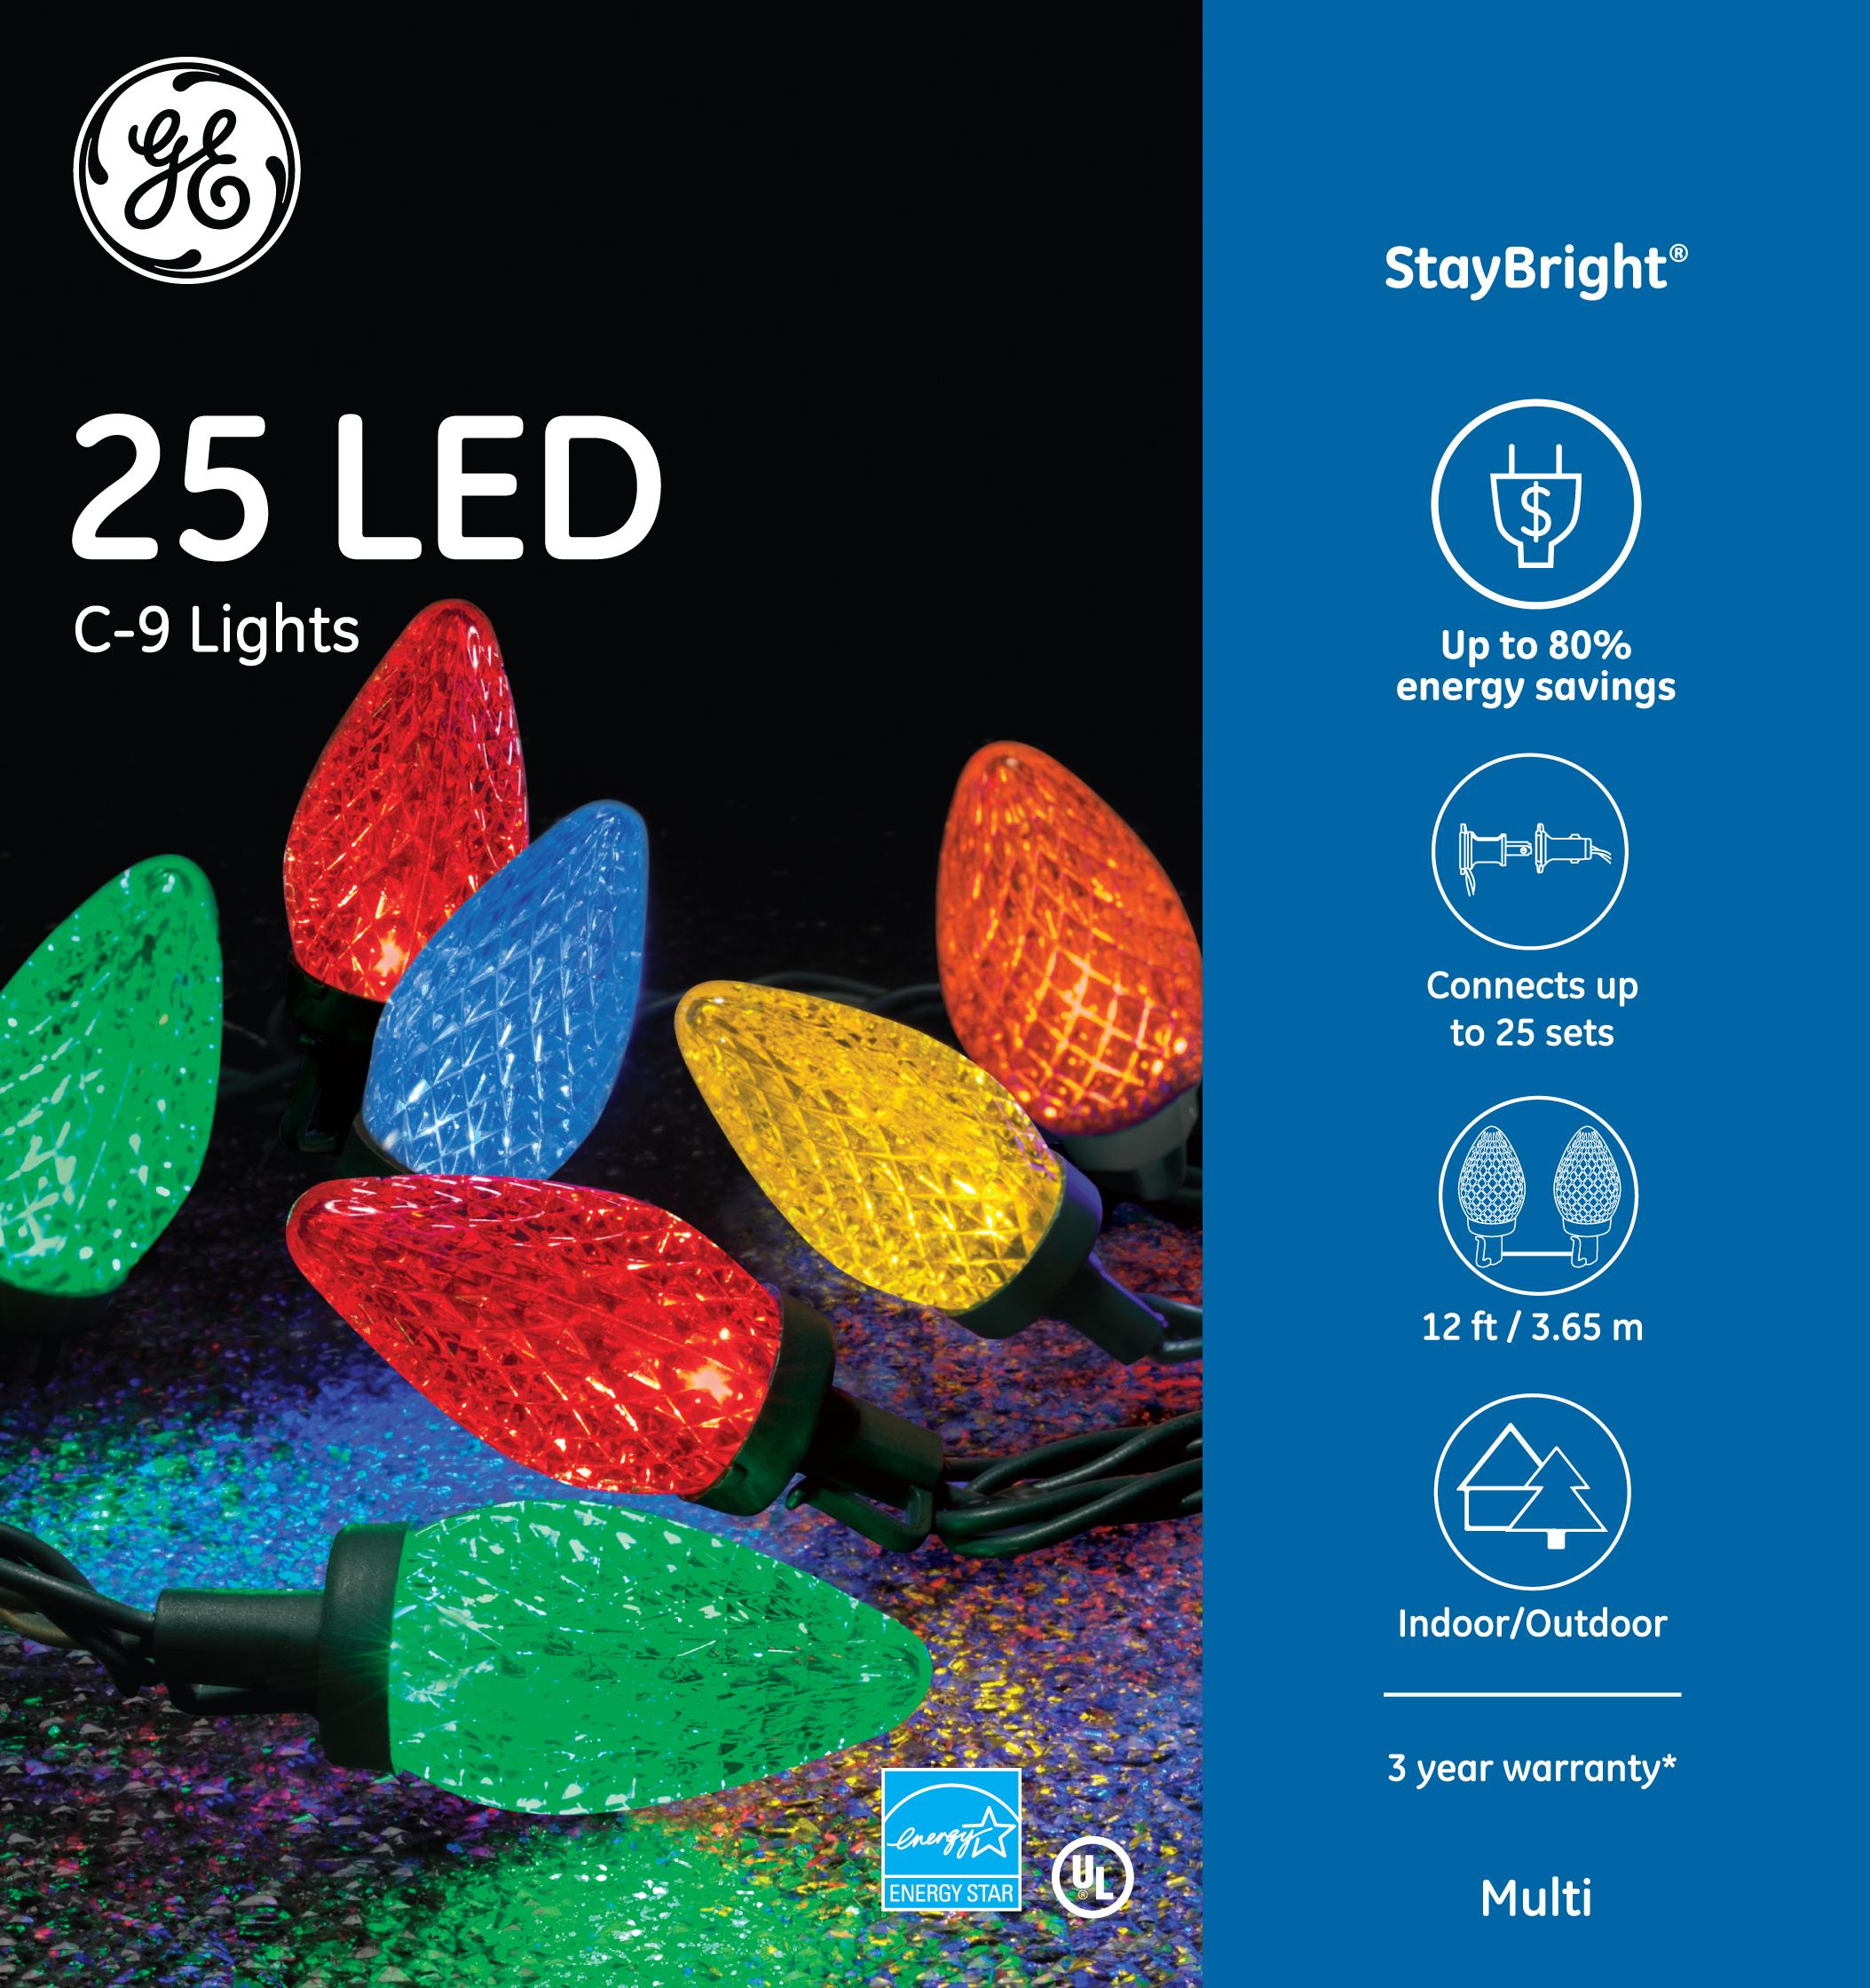 90905 Ge Staybright 174 Led C 9 Lights 25ct Multi Ge